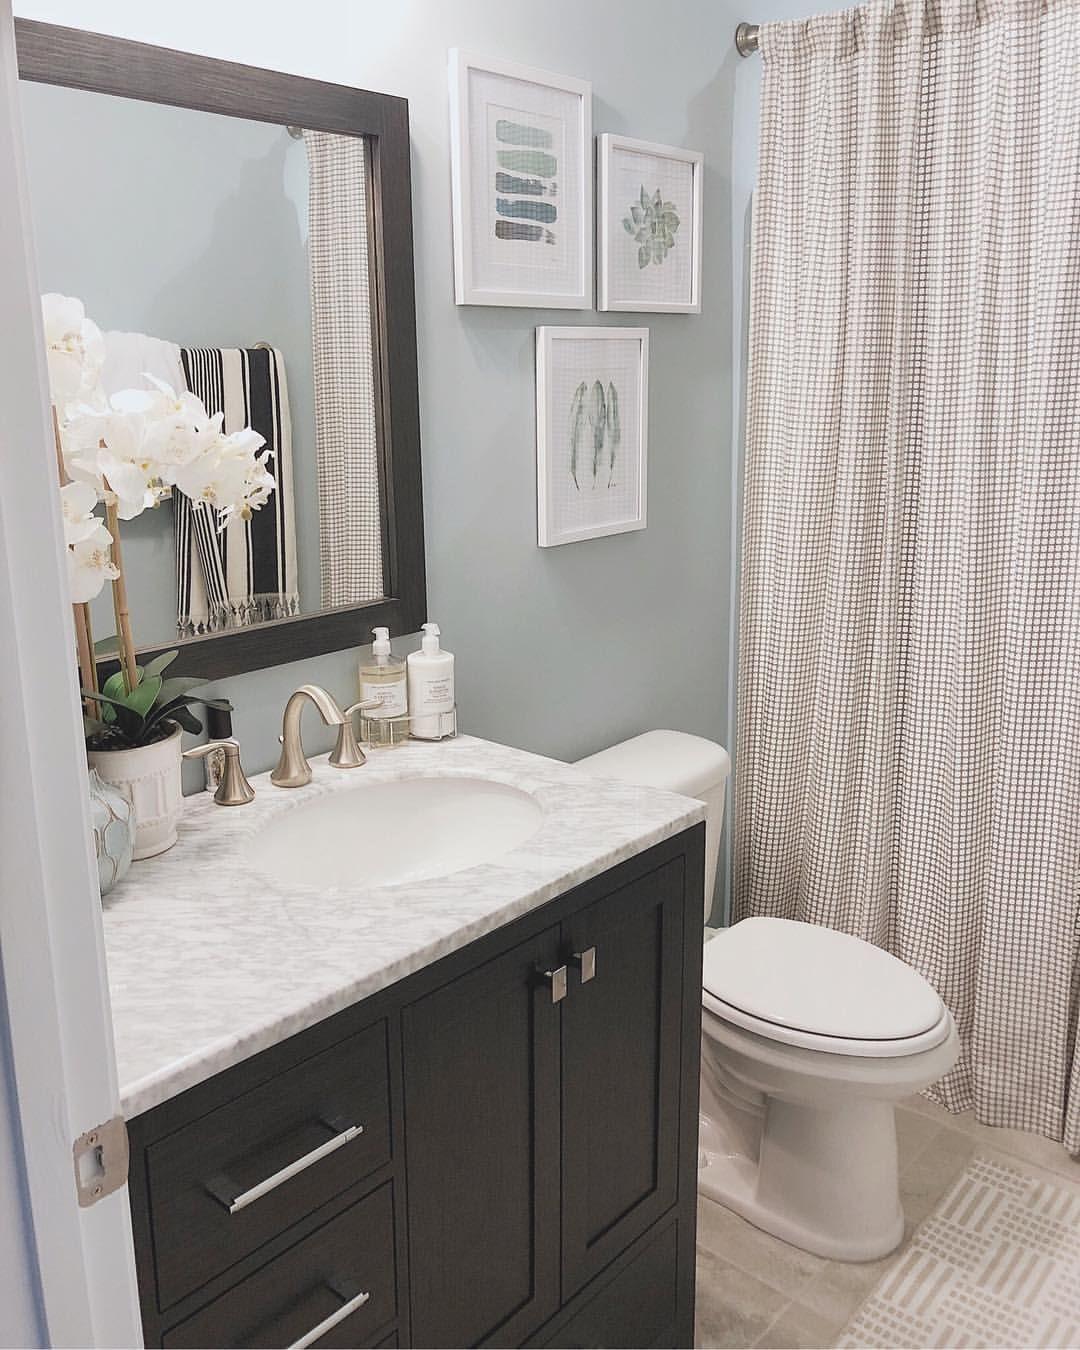 Bathroom Decor Small Bathroom Ideas Kid Bathroom Ideaa Small